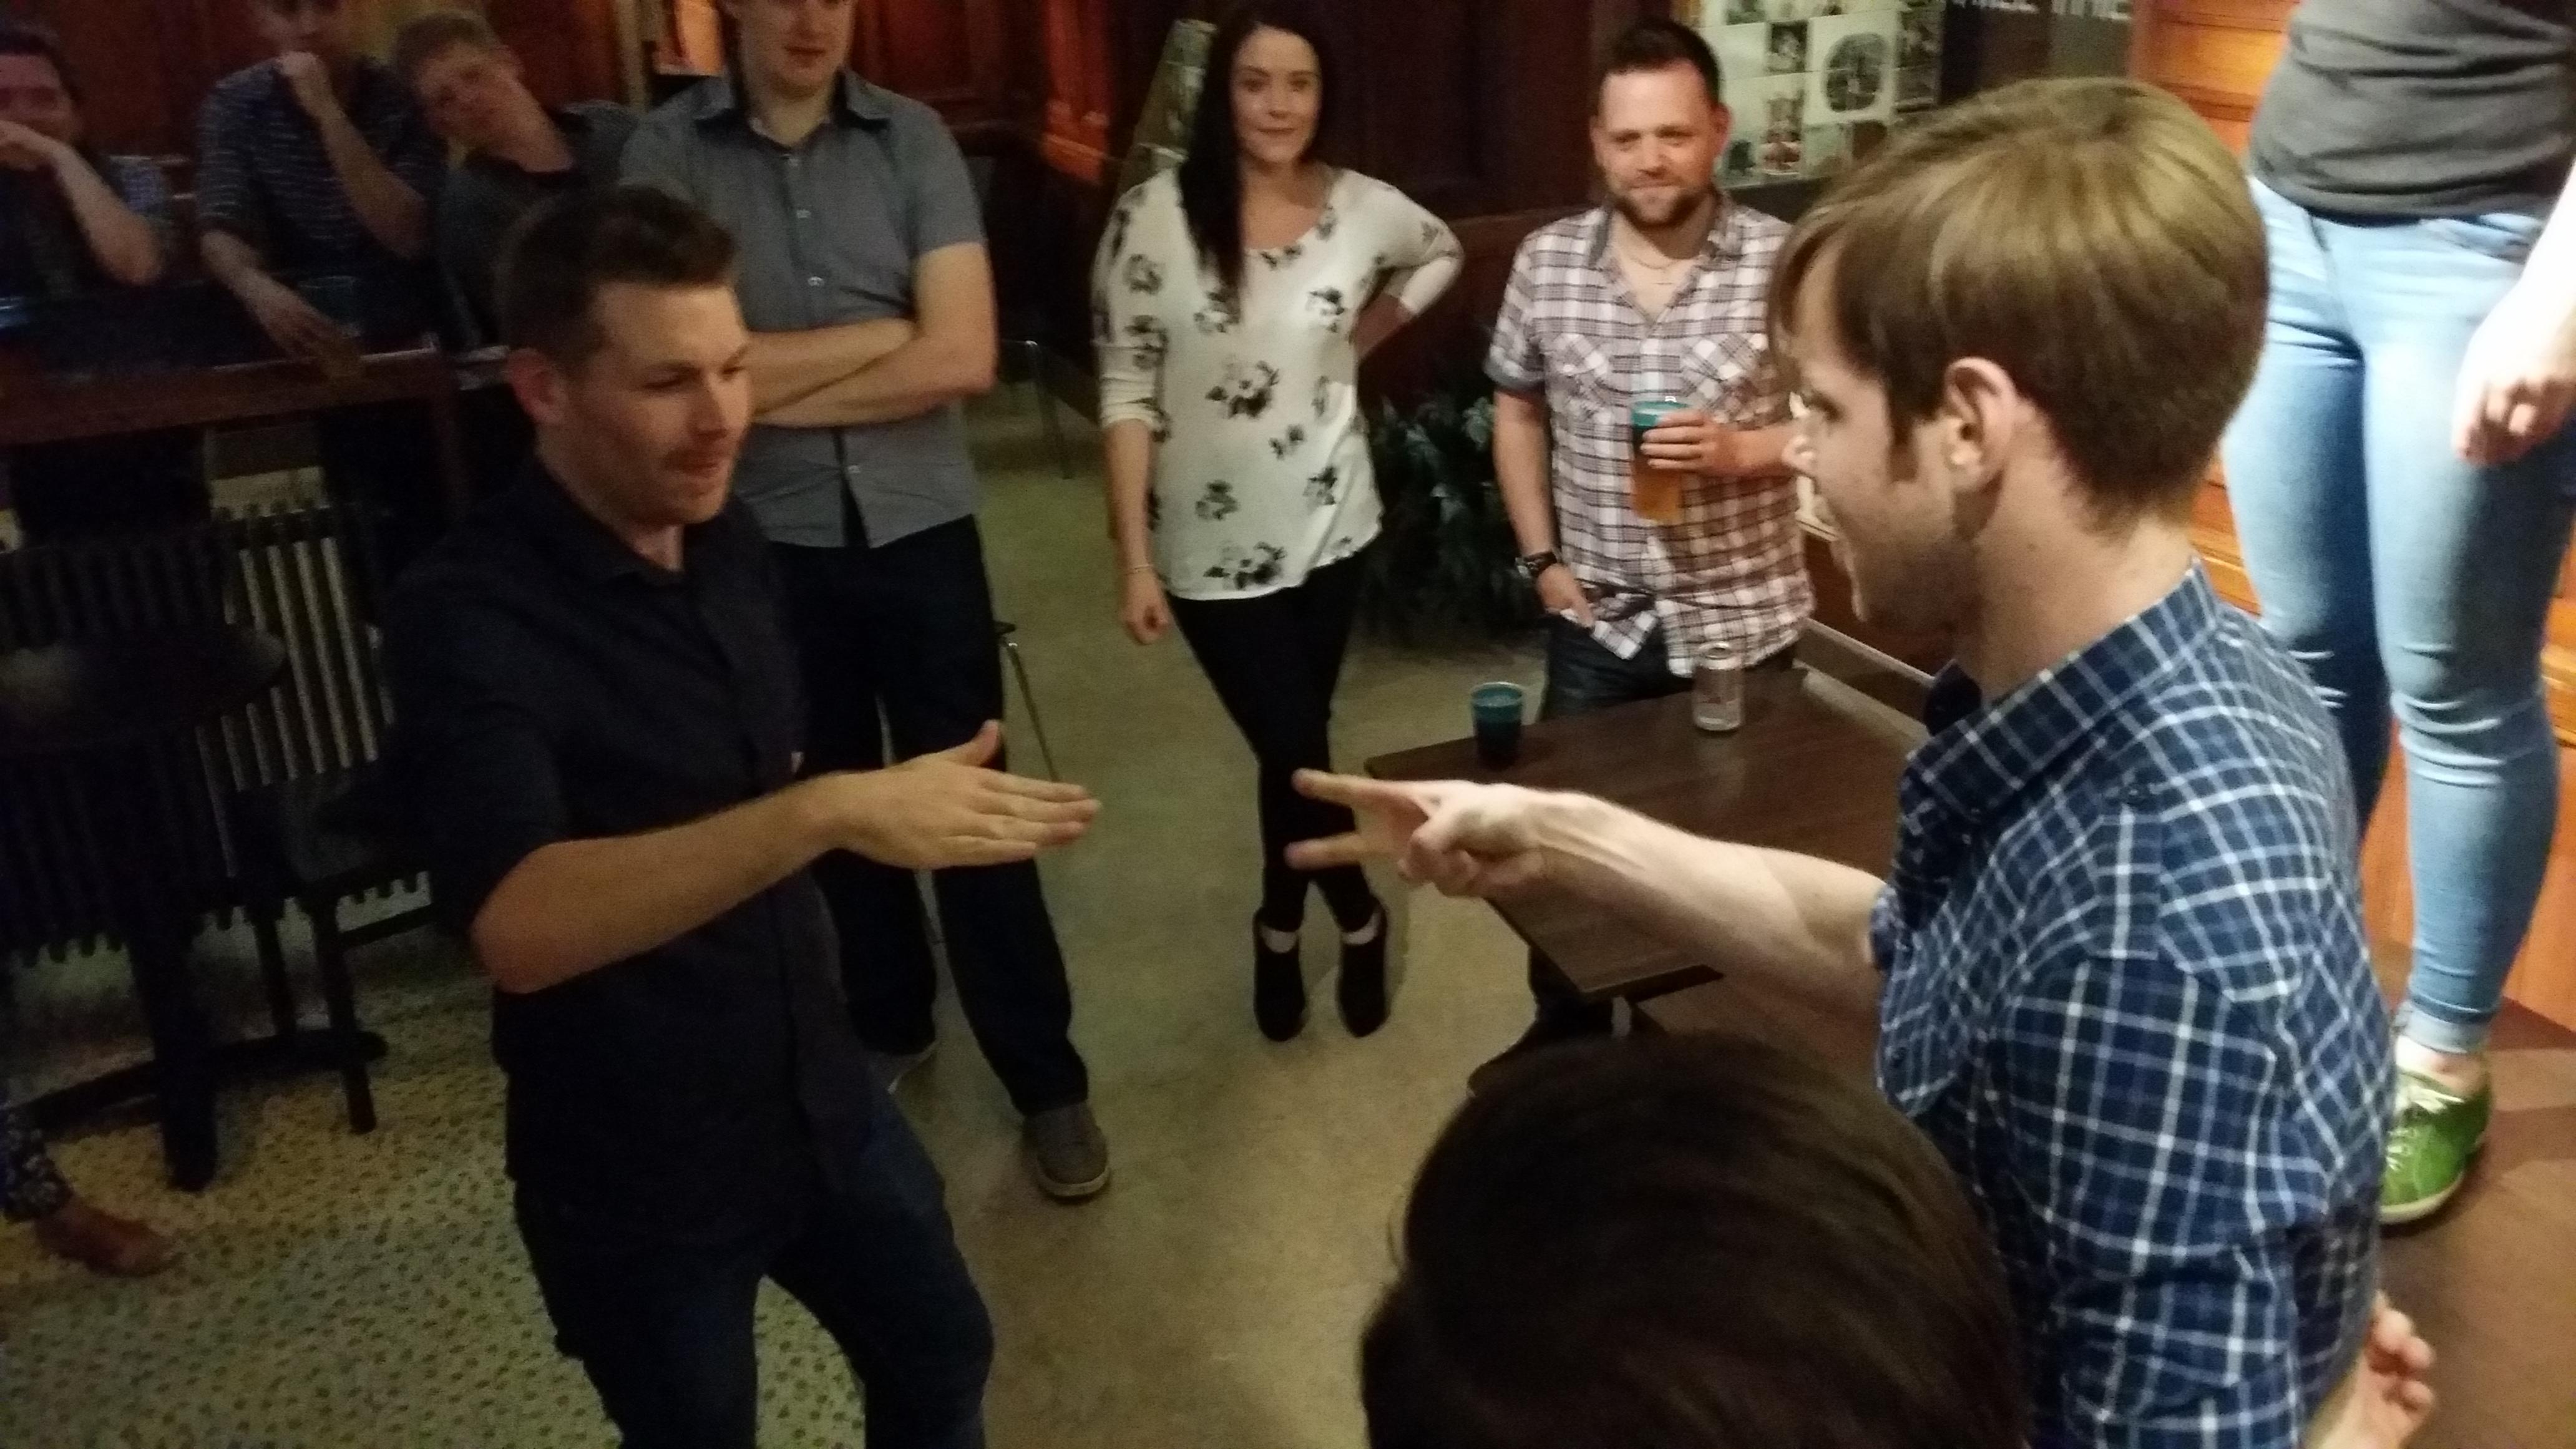 'Rock, Paper, Scissors, Lizard, Spock' final - the more traditional scissor cuts paper wins it for Thomas